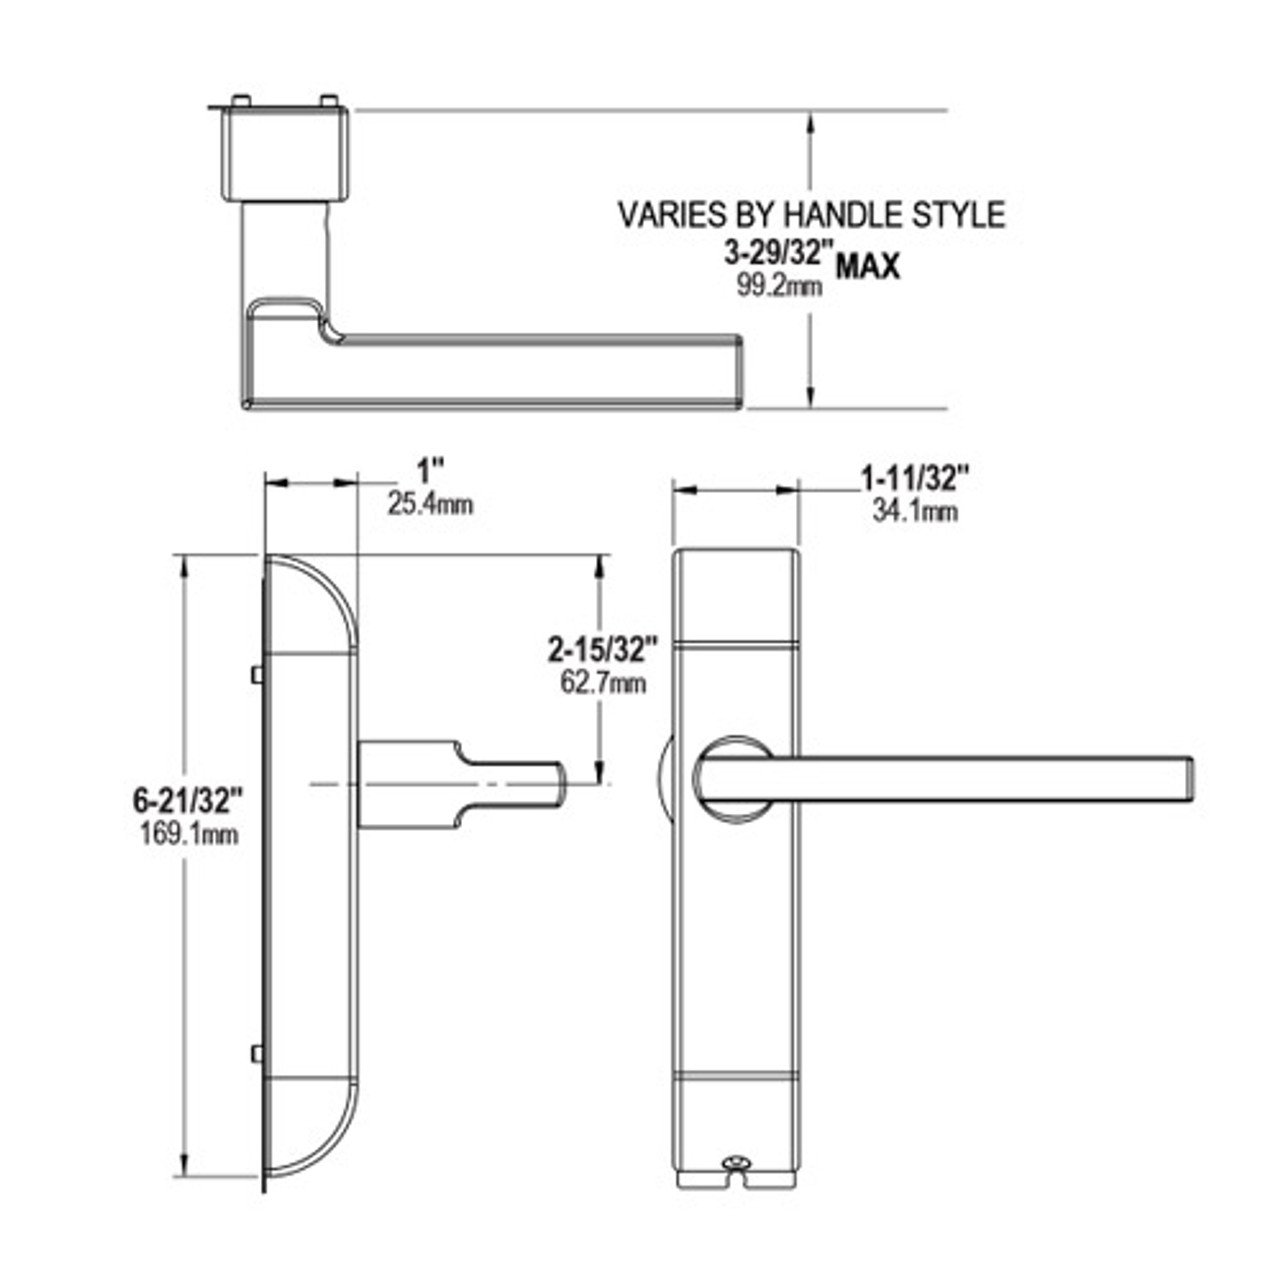 4600-MD-551-US3 Adams Rite MD Designer handle Dimensional View